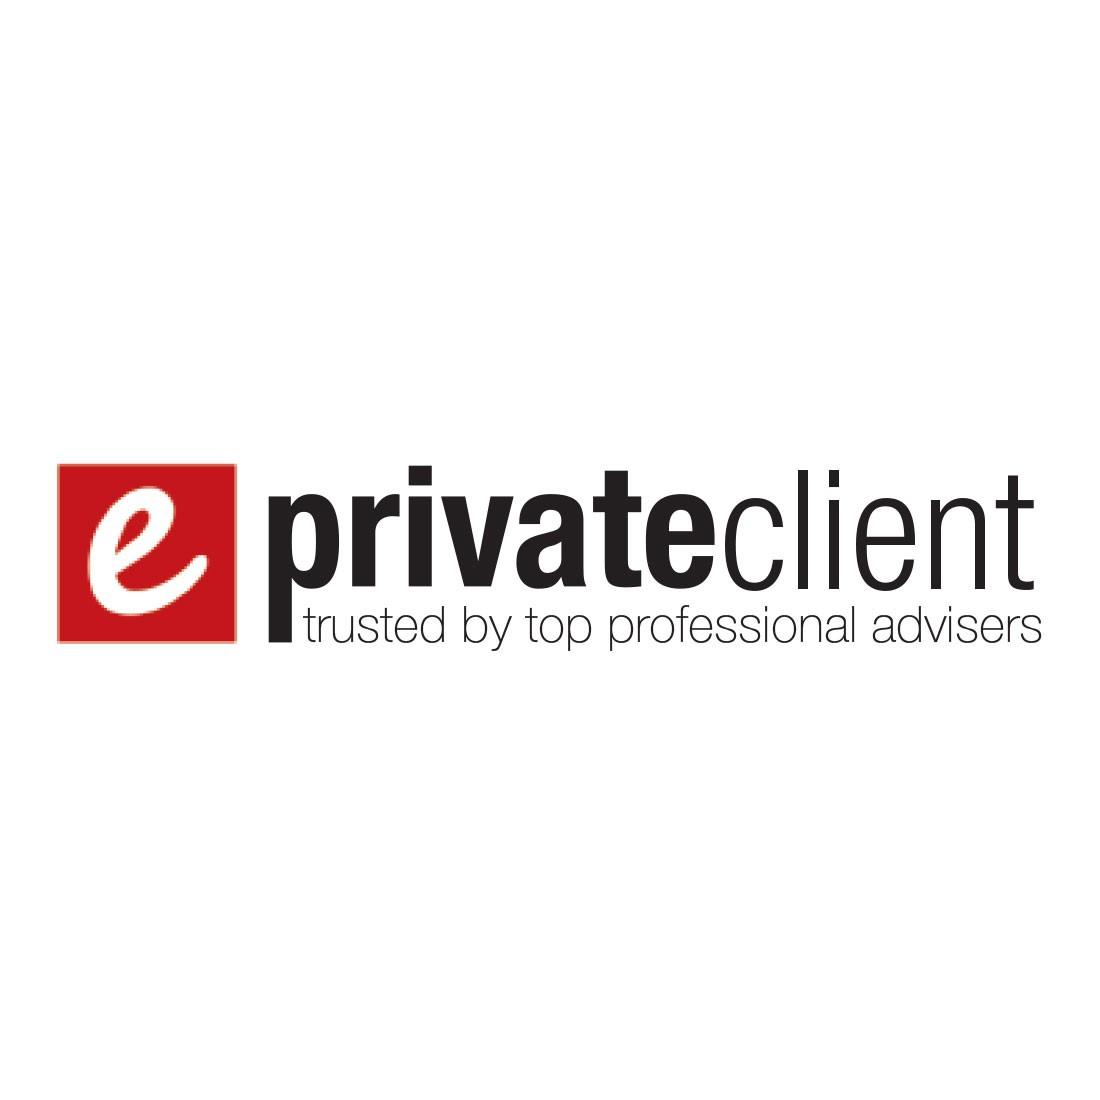 eprivateclient.com